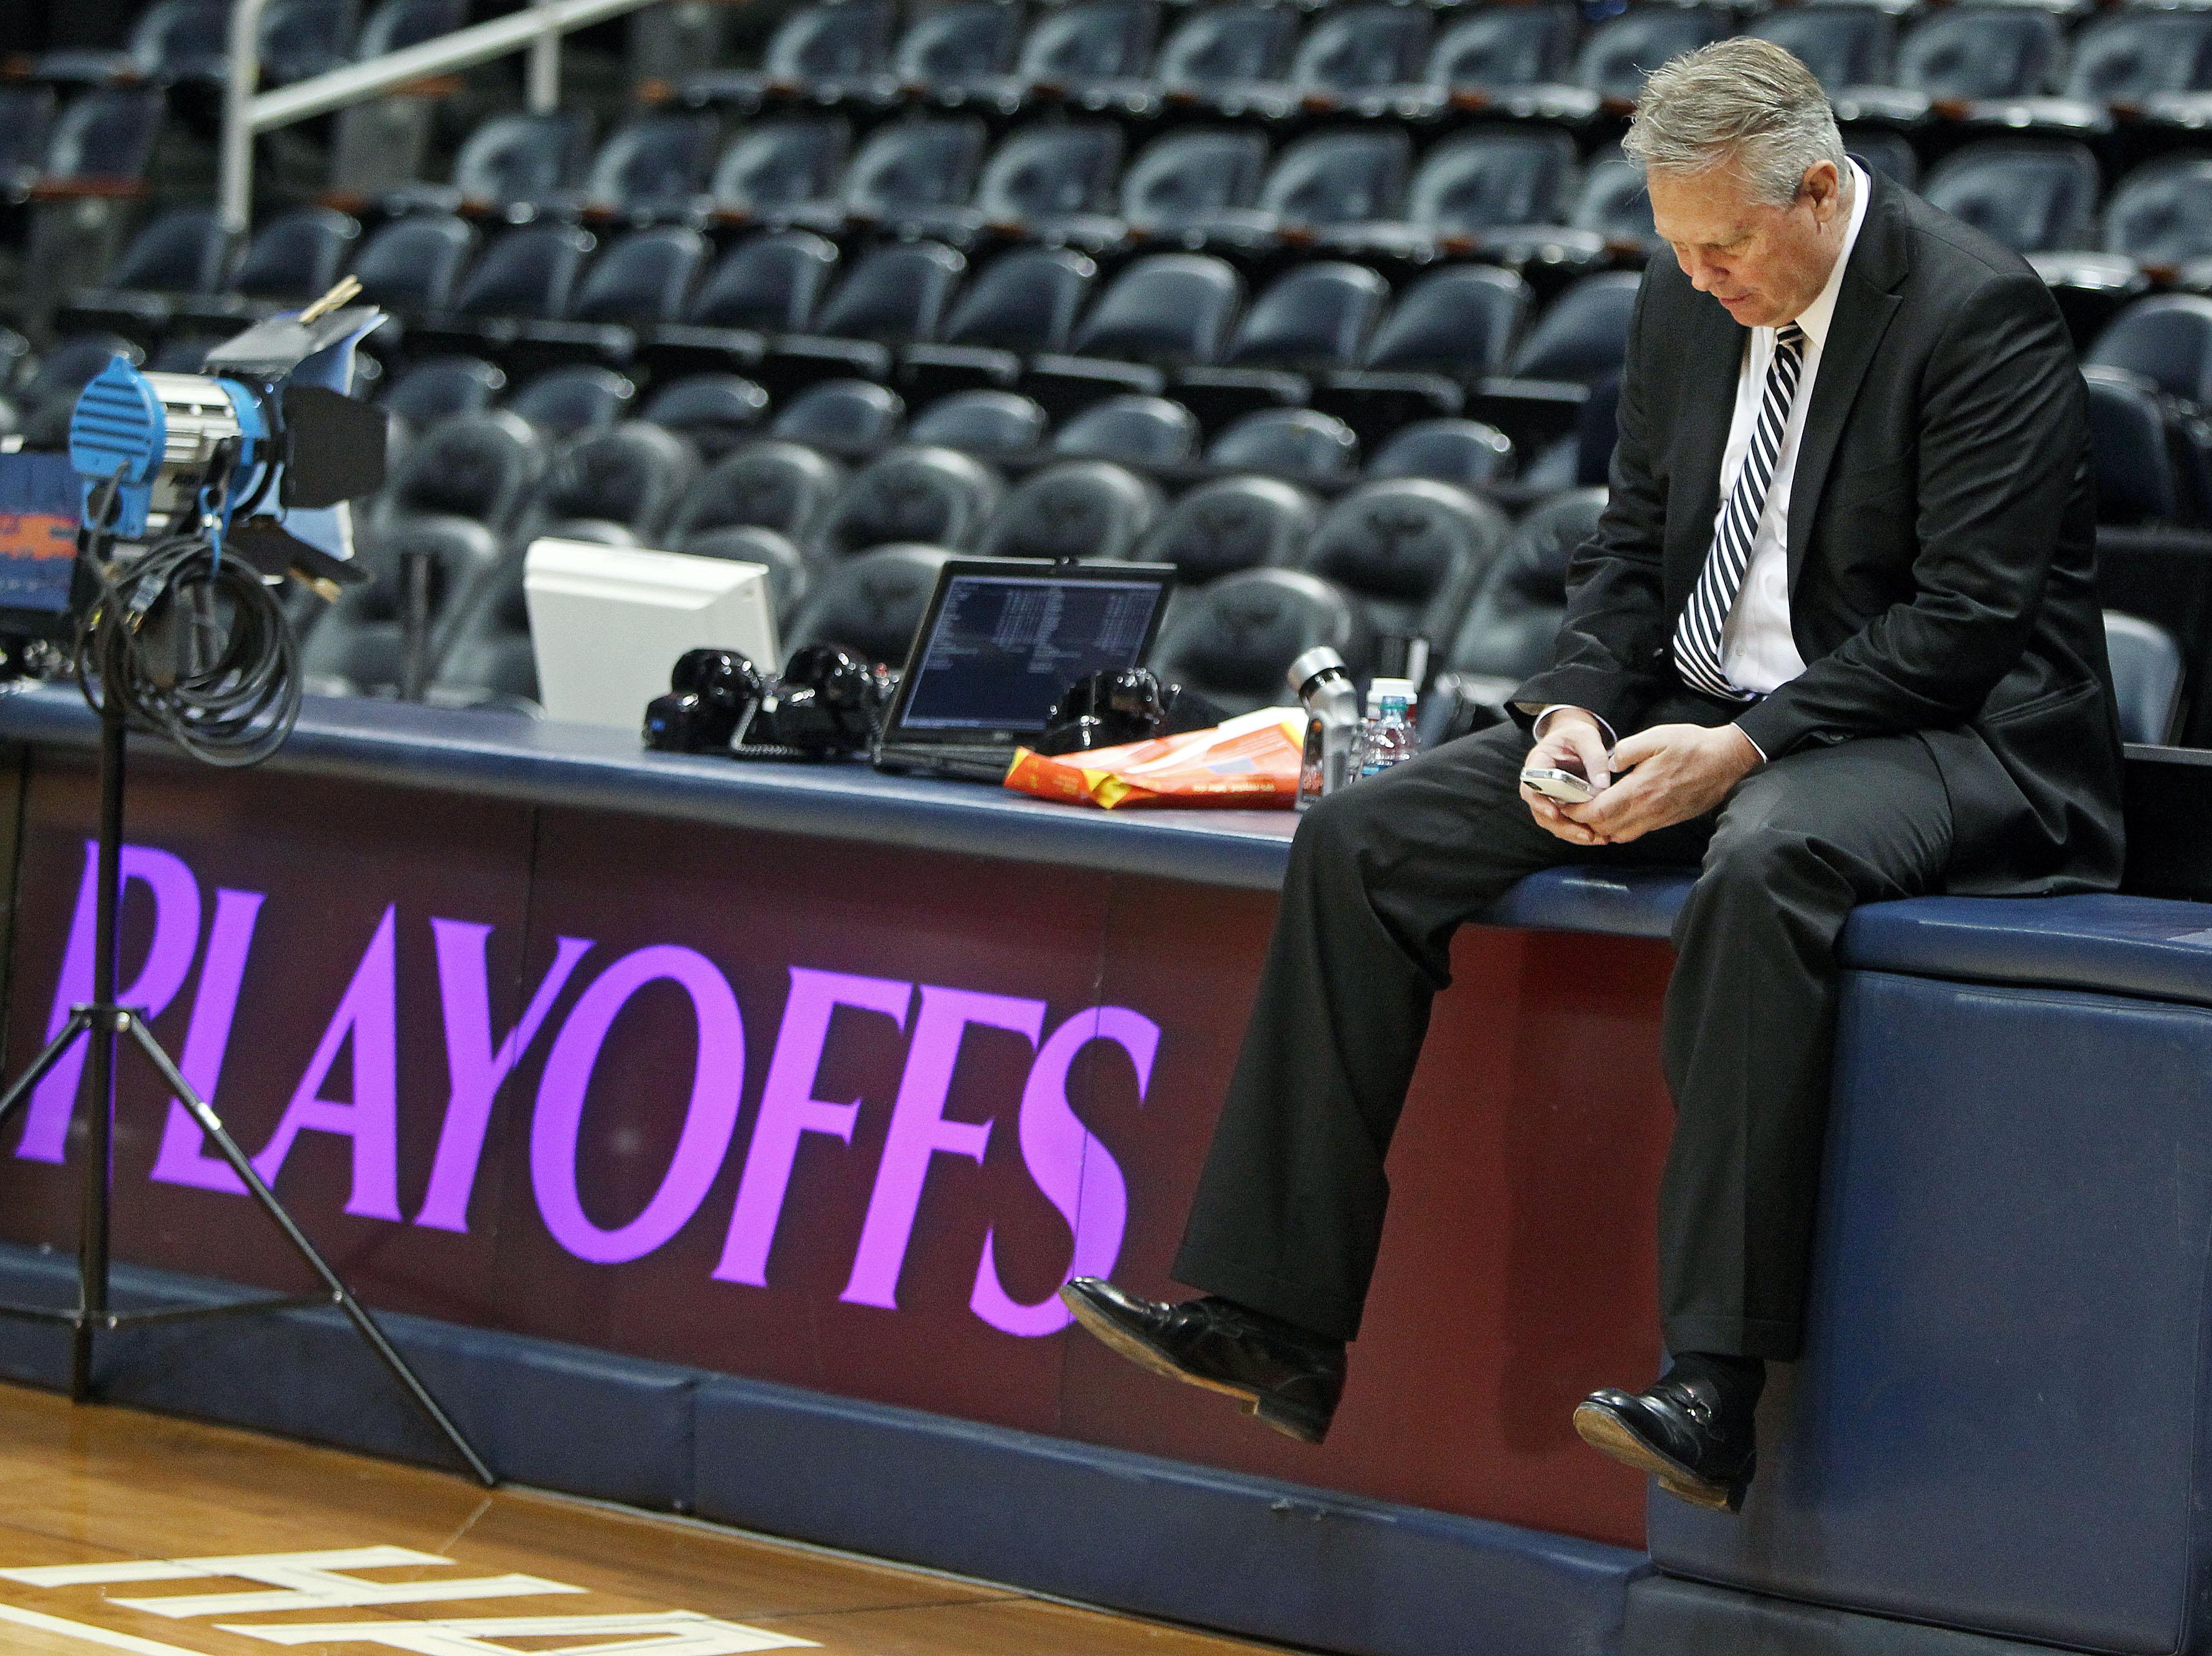 Boston Celtics Vs. Atlanta Hawks At Philips Arena